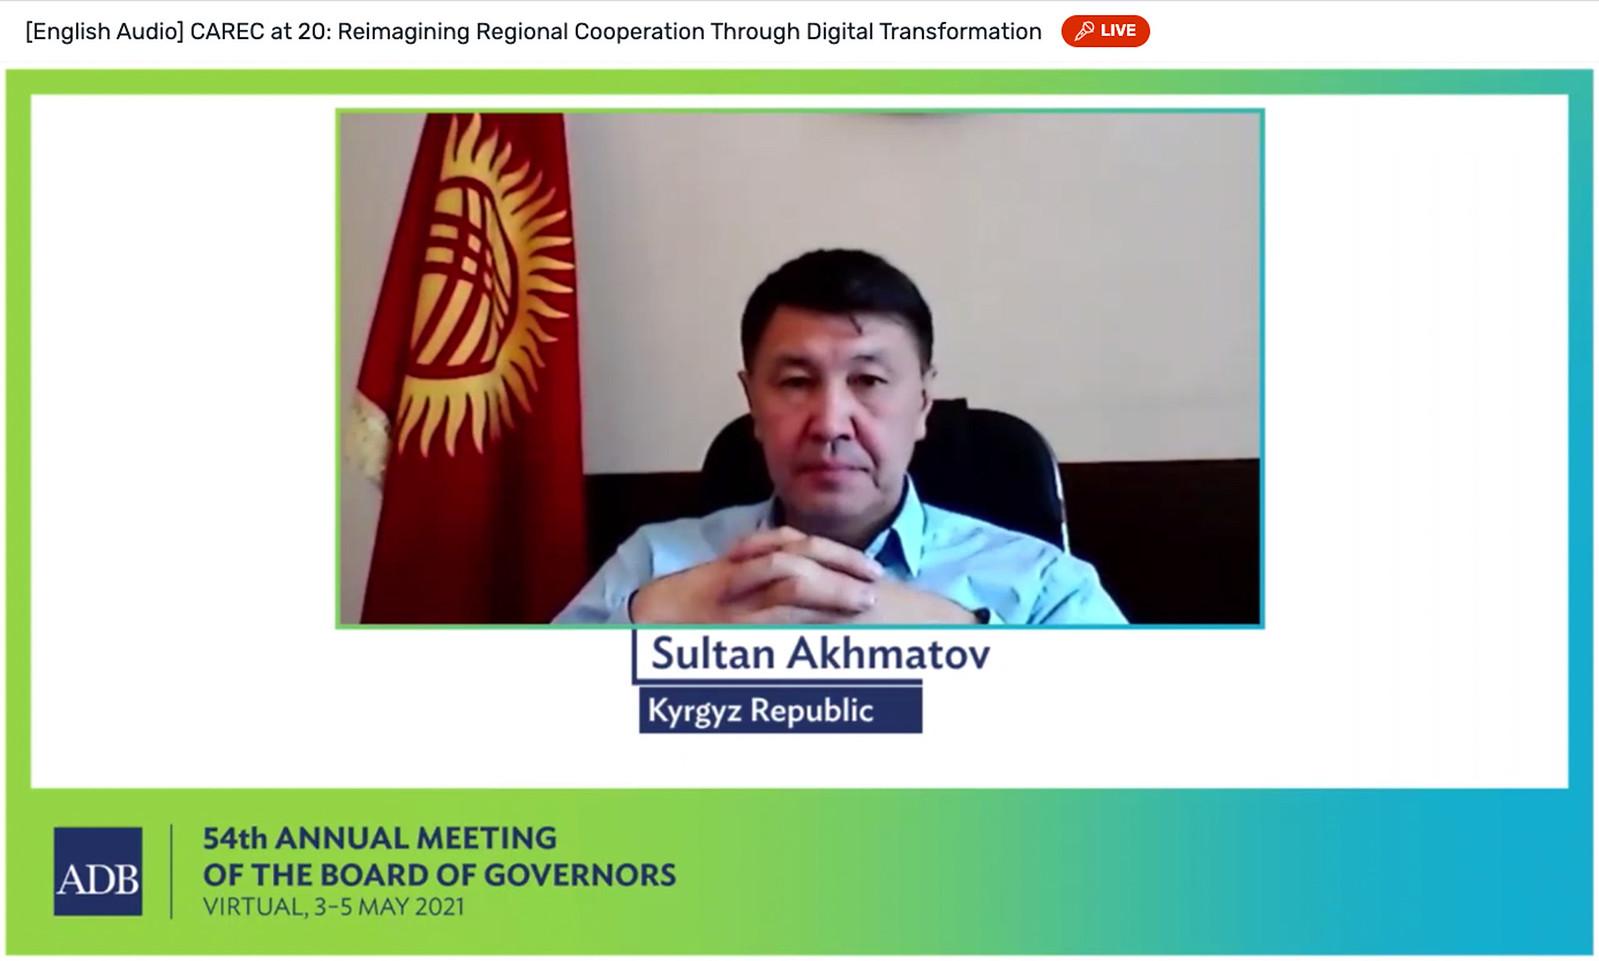 Reimagining Regional Cooperation Through Digital Transformation - 2021 Annual Meeting